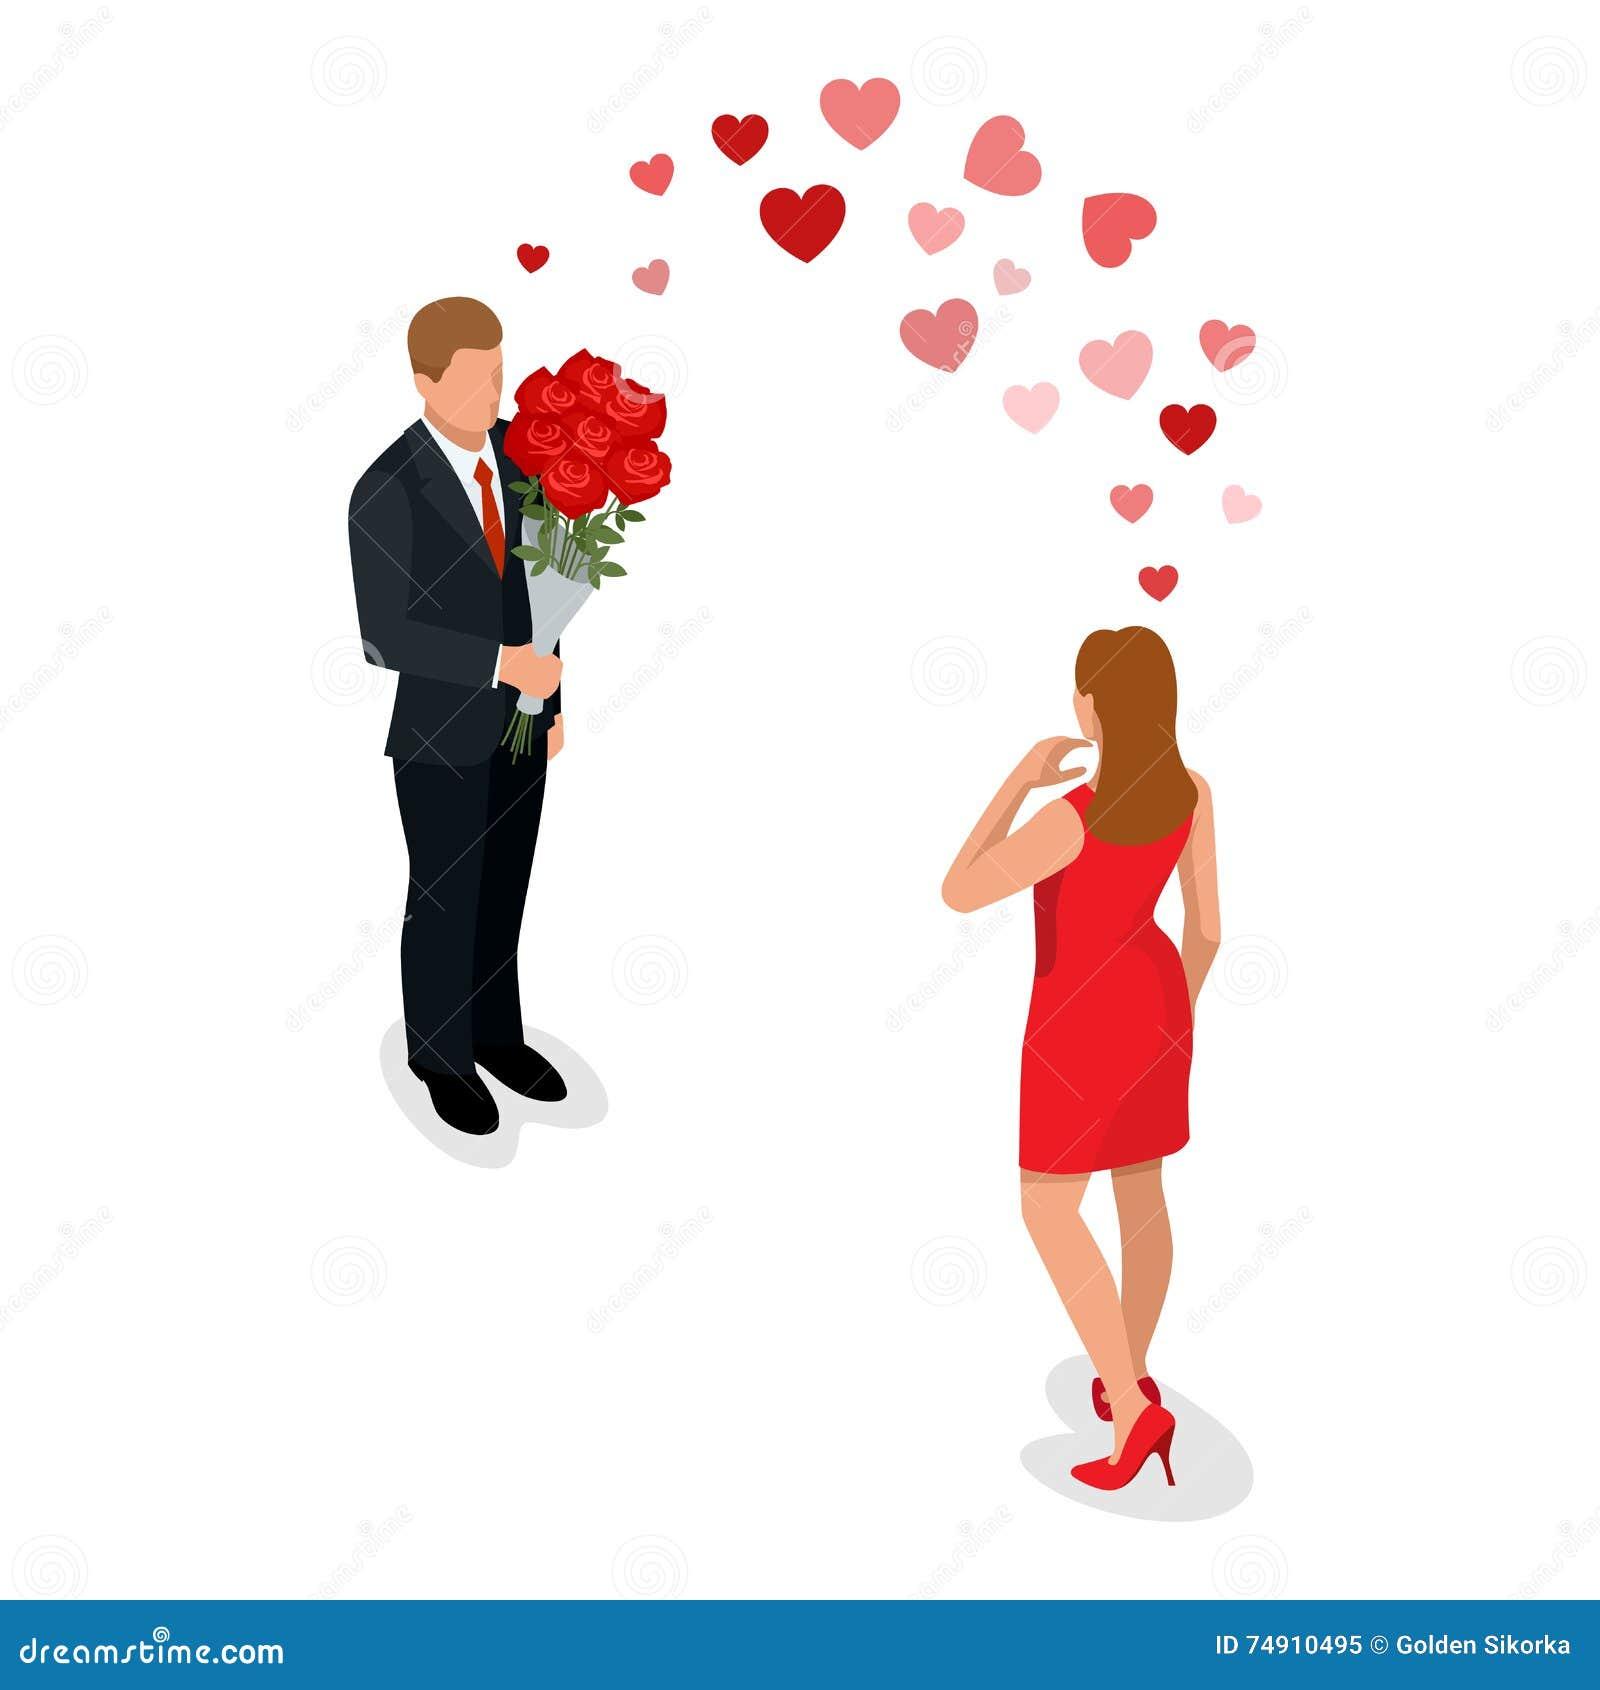 Cyberdreamdatecom Date Dream Love Meeting